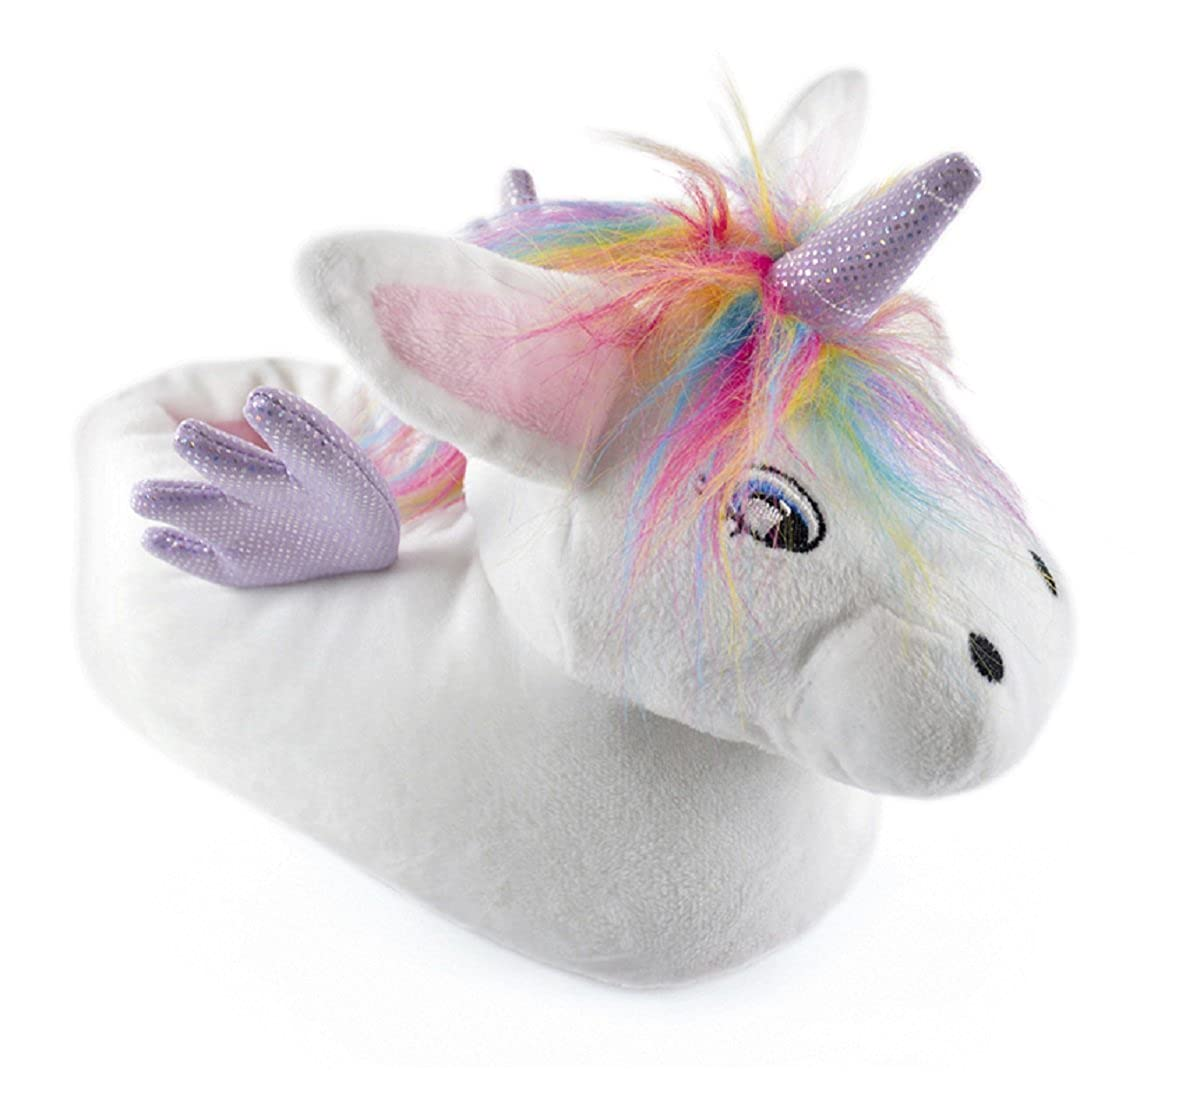 Kids 3D Unicorn Novelty Slippers Soft Plush Rainbow Fluffy Warm Indoor Shoes